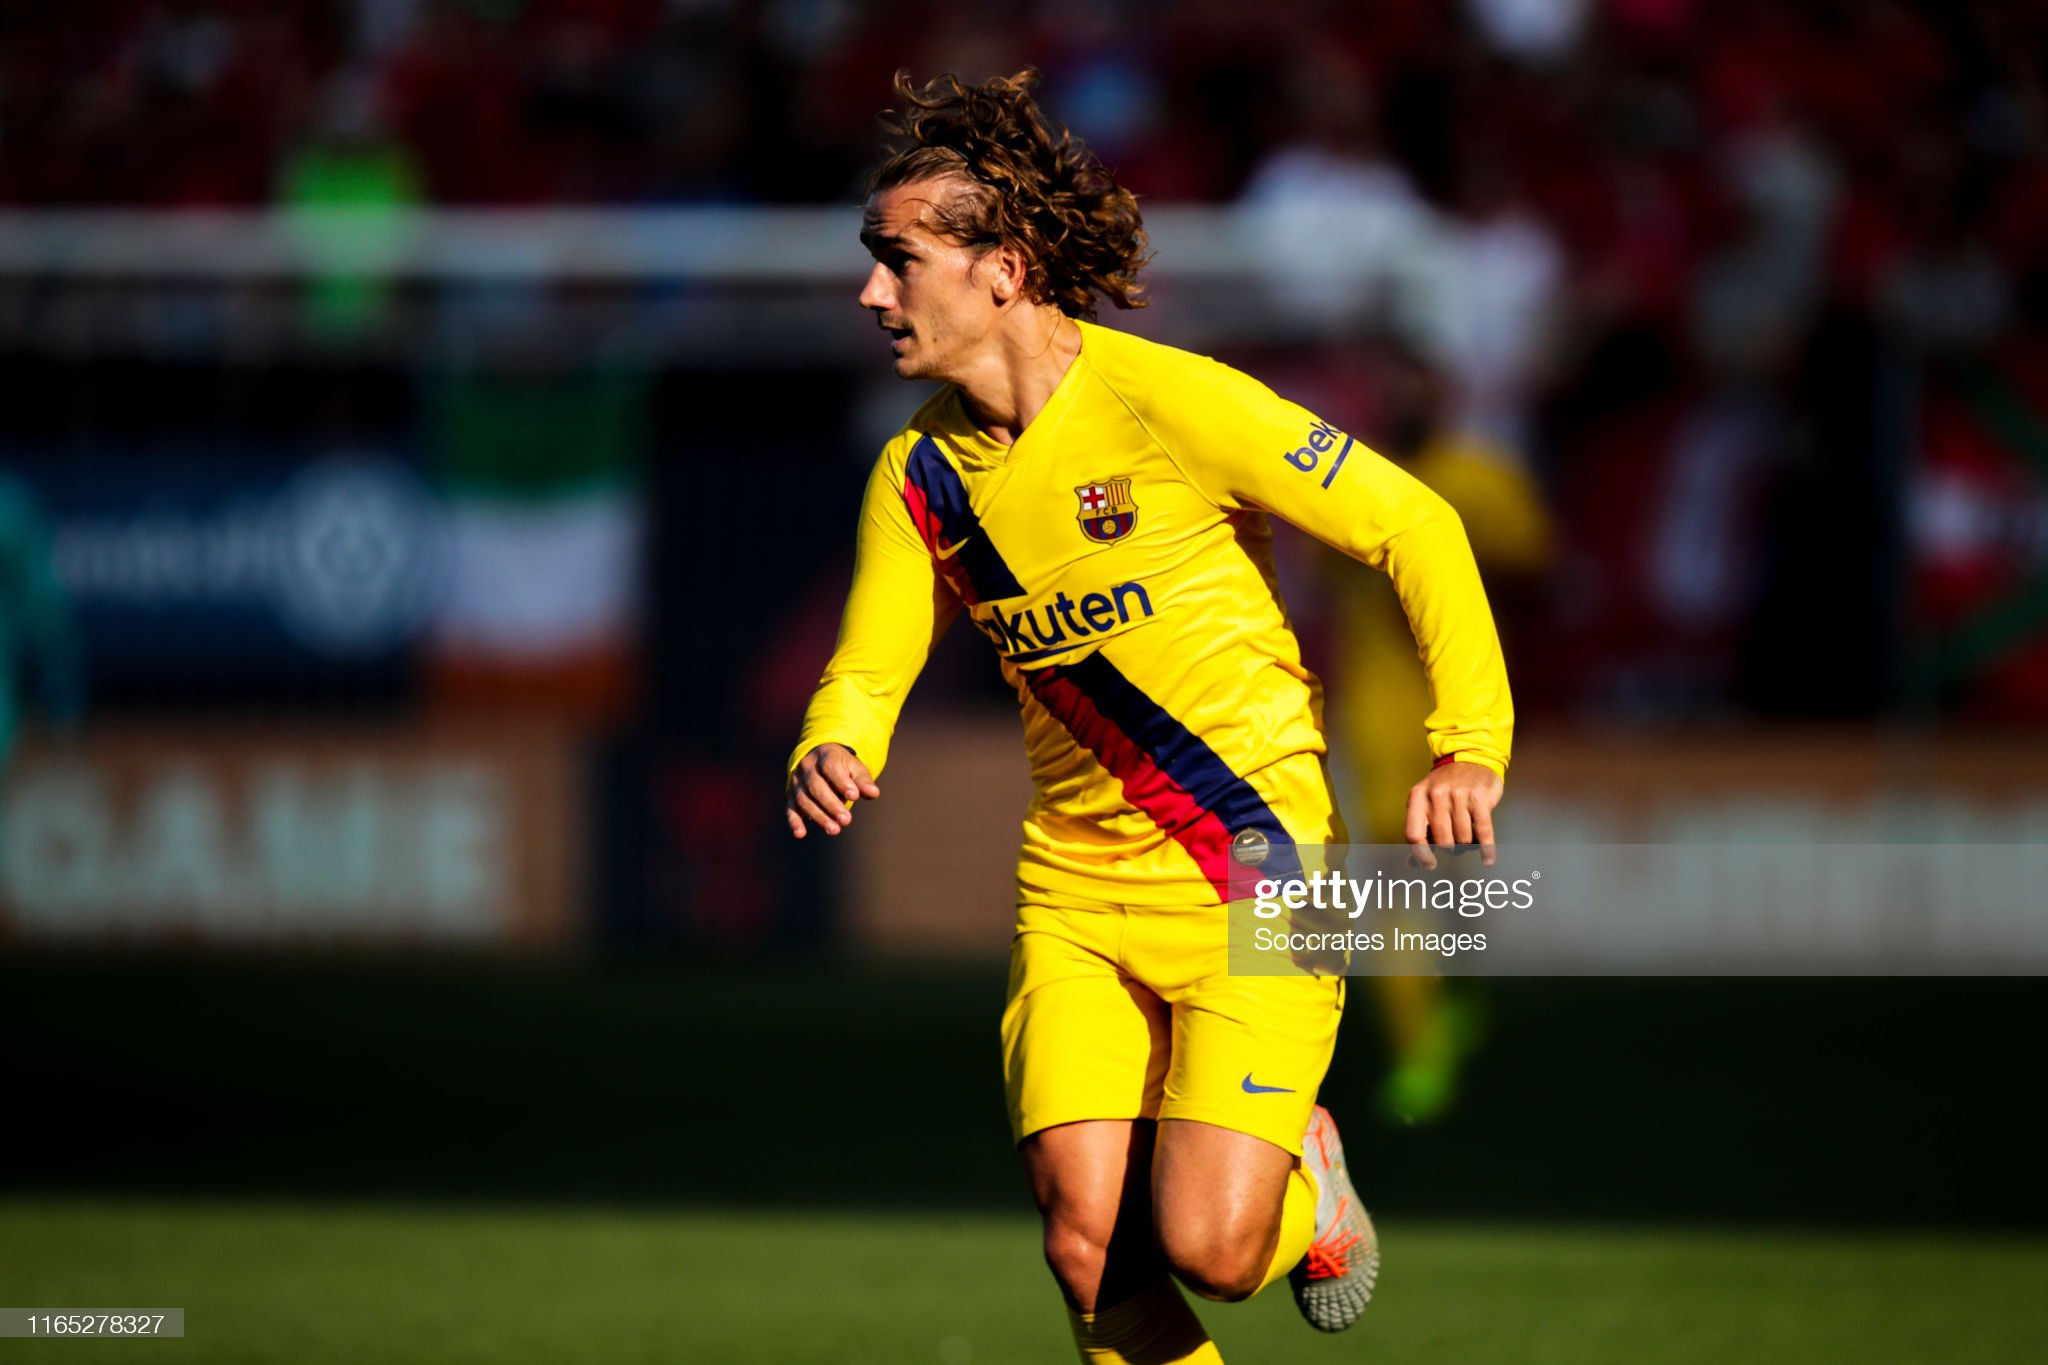 صور مباراة : أوساسونا - برشلونة 2-2 ( 31-08-2019 )  Antoine-griezmann-of-fc-barcelona-during-the-la-liga-santander-match-picture-id1165278327?s=2048x2048